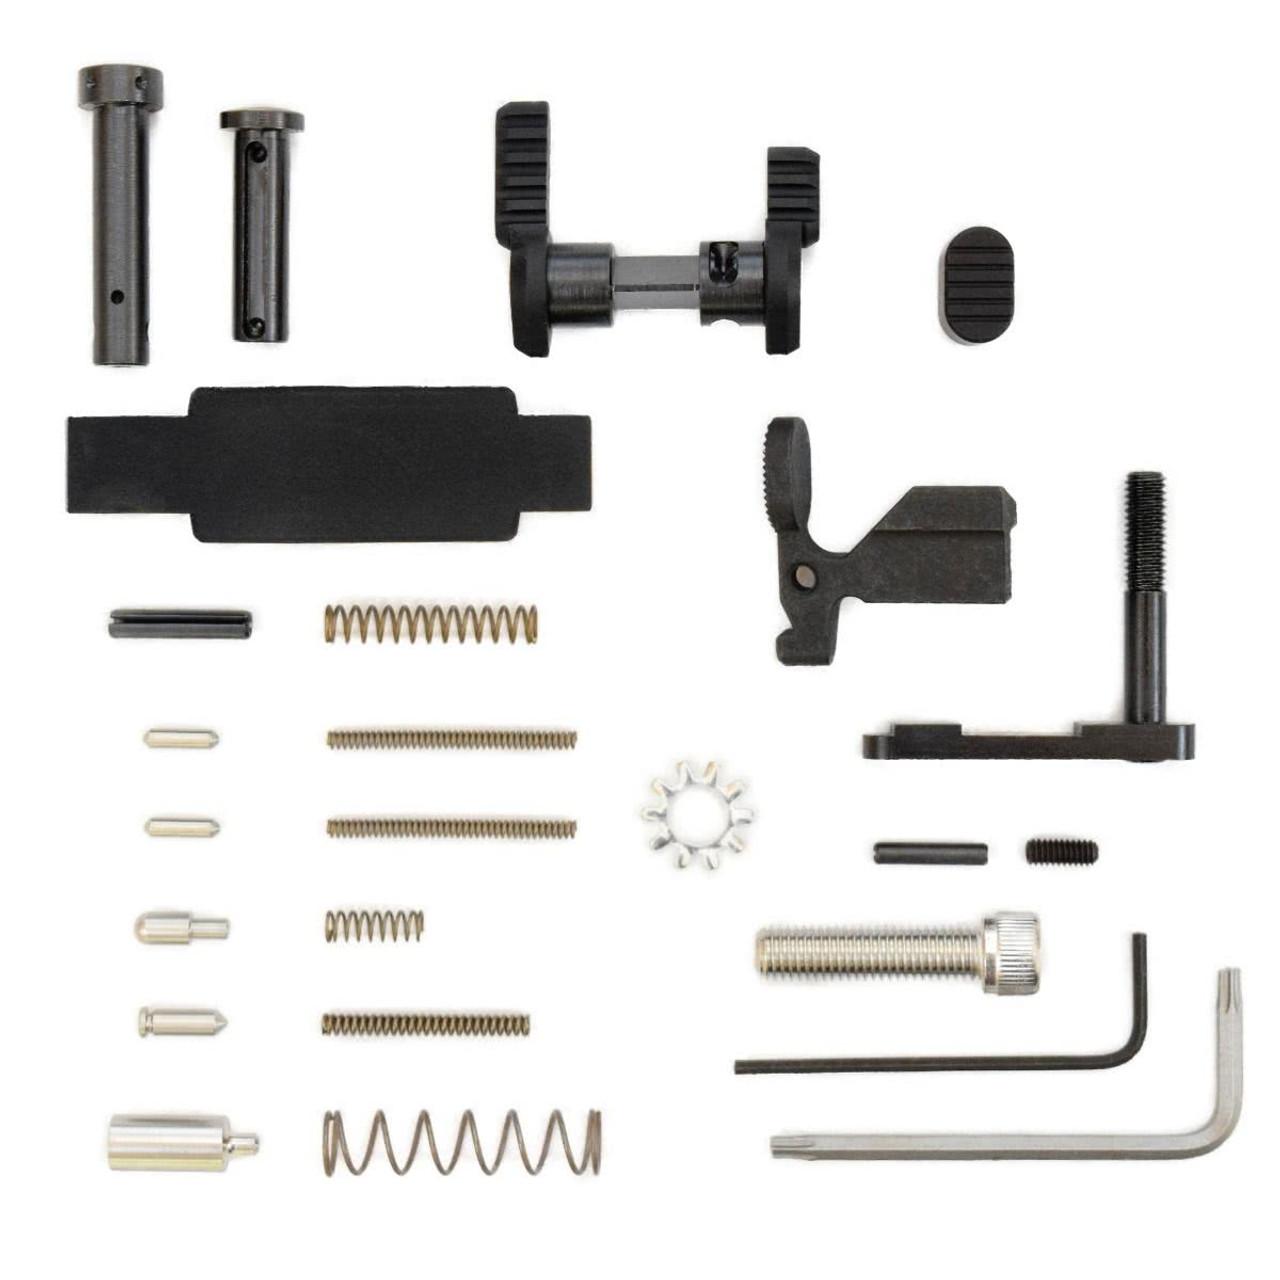 Armaspec Superlight AR15 Lower Parts Kit LPK